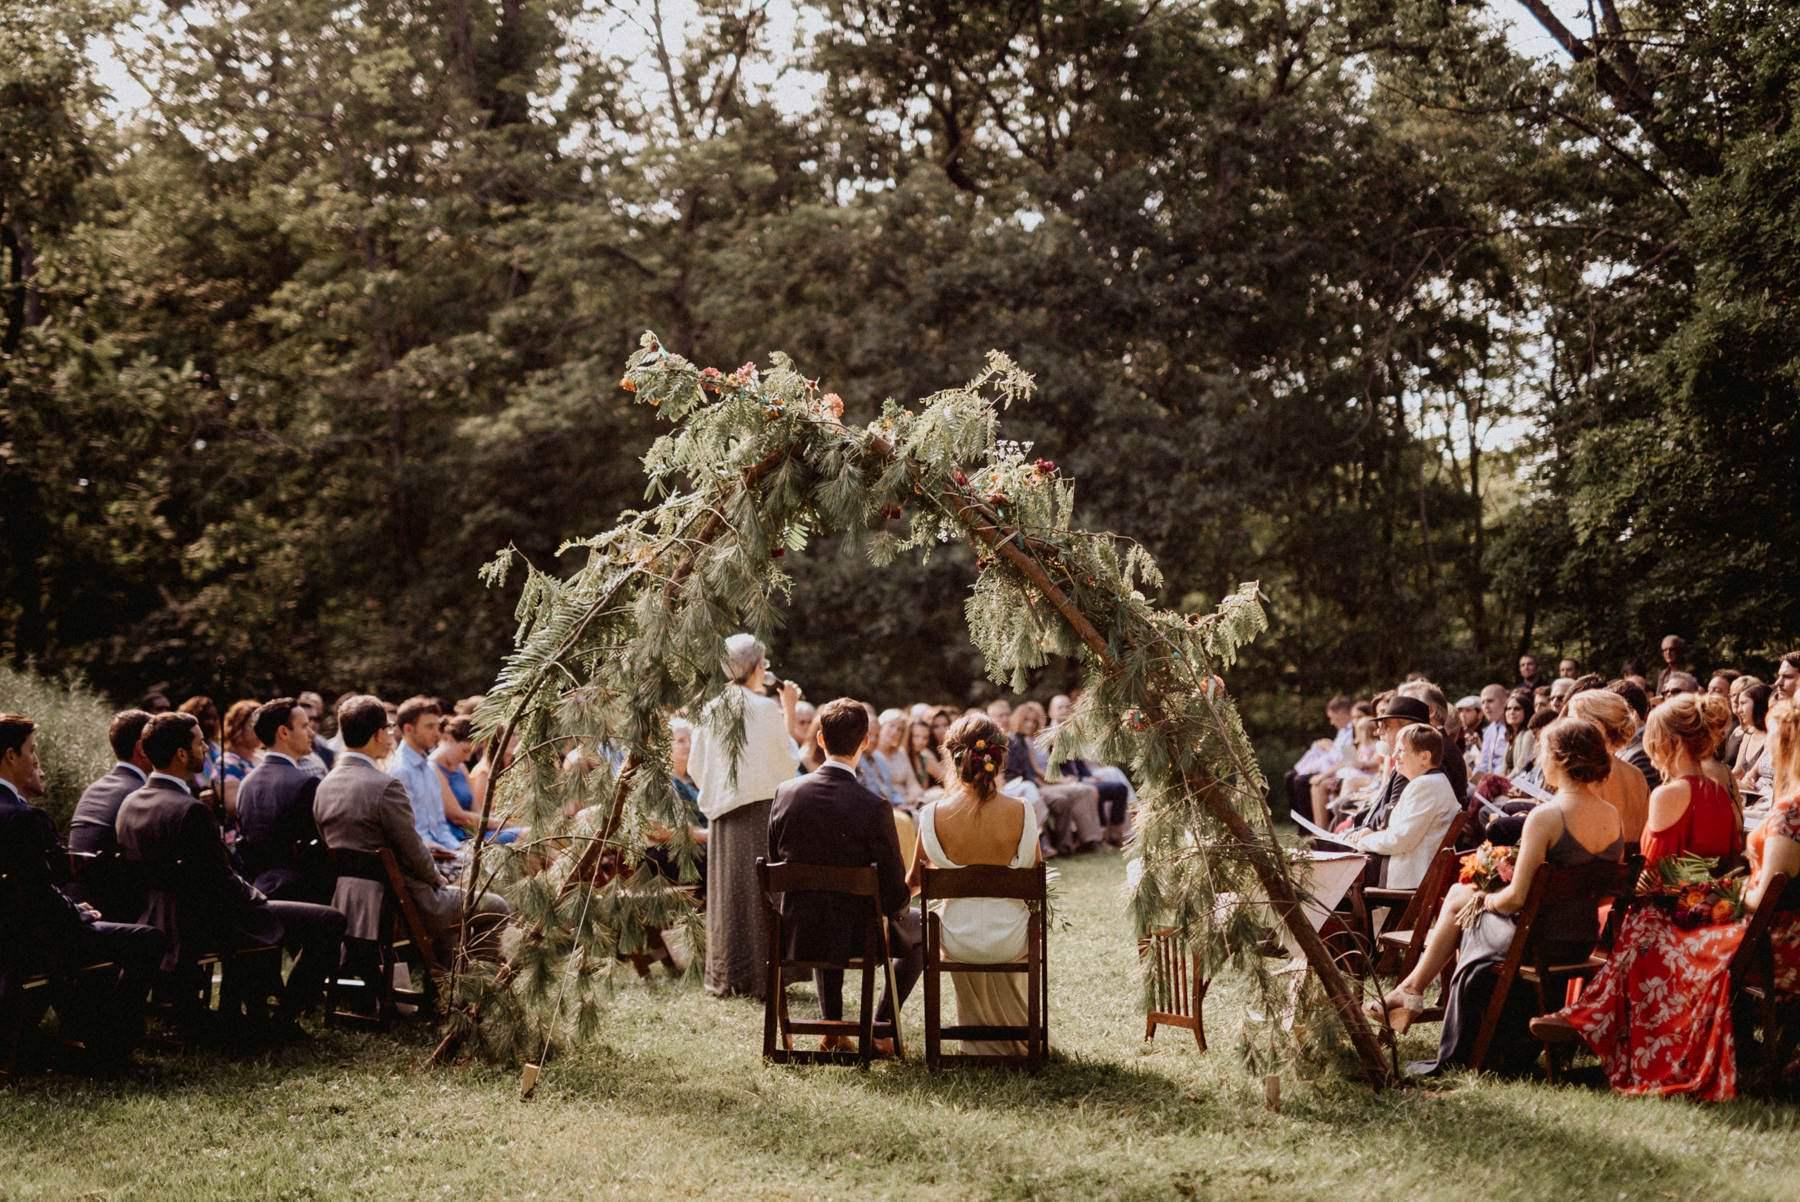 pennsylvania-private-estate-wedding-66.jpg